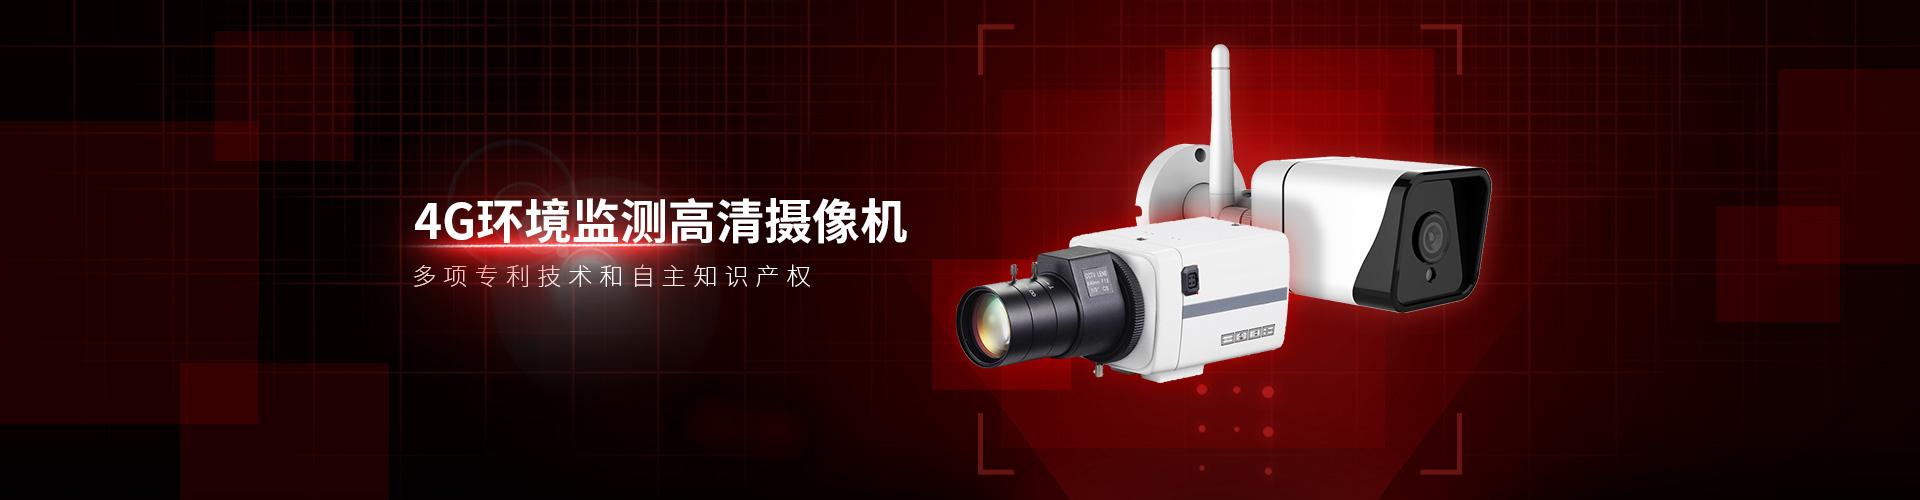 4G环境监测高清摄像机